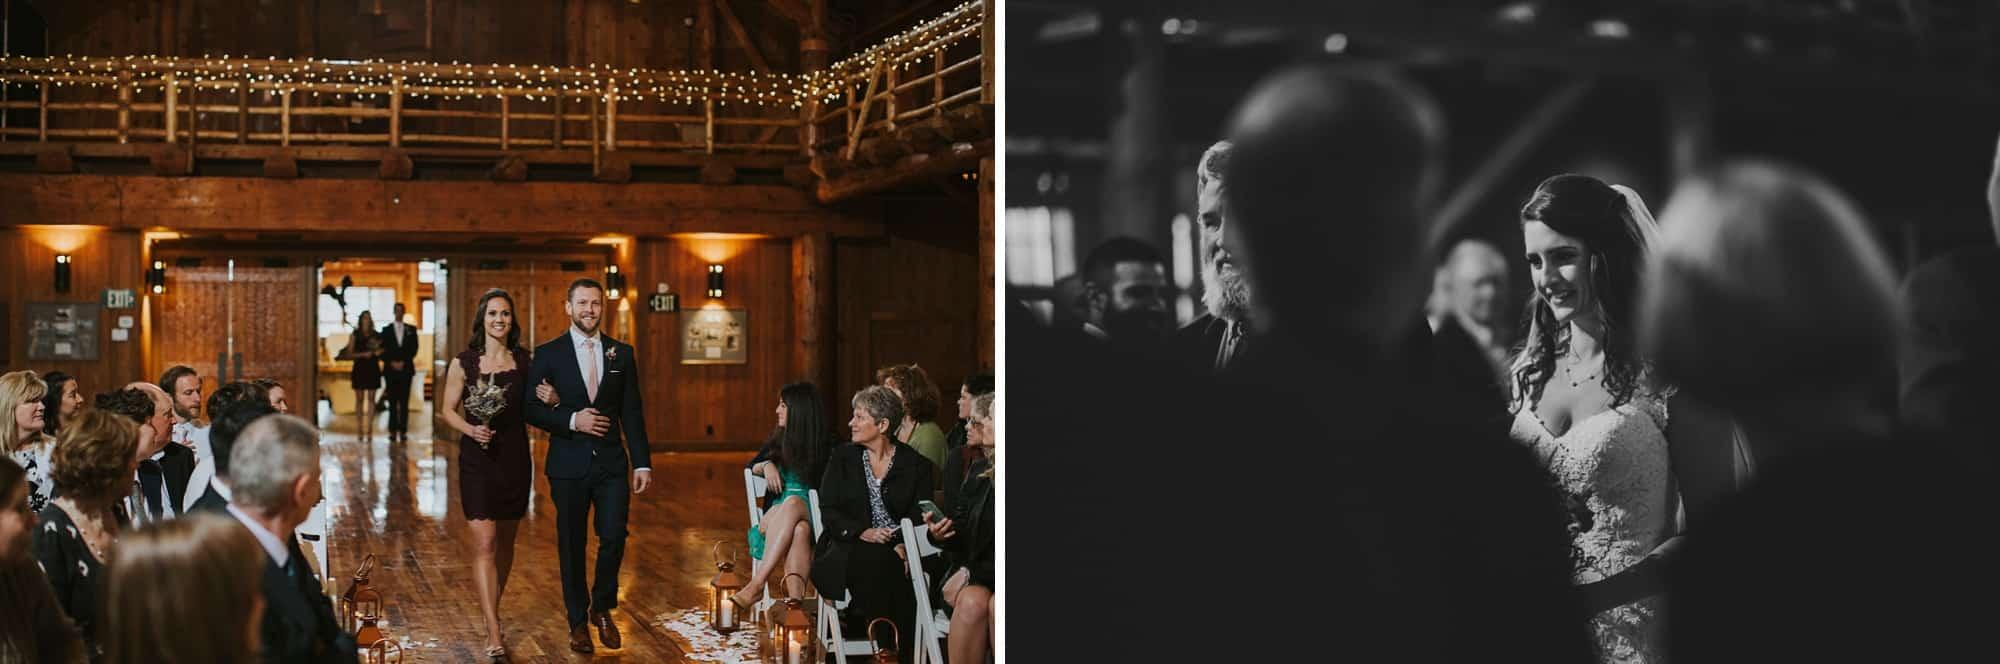 Sara Emily Sunriver Bend Oregon Rustic Lodge Wedding 0038